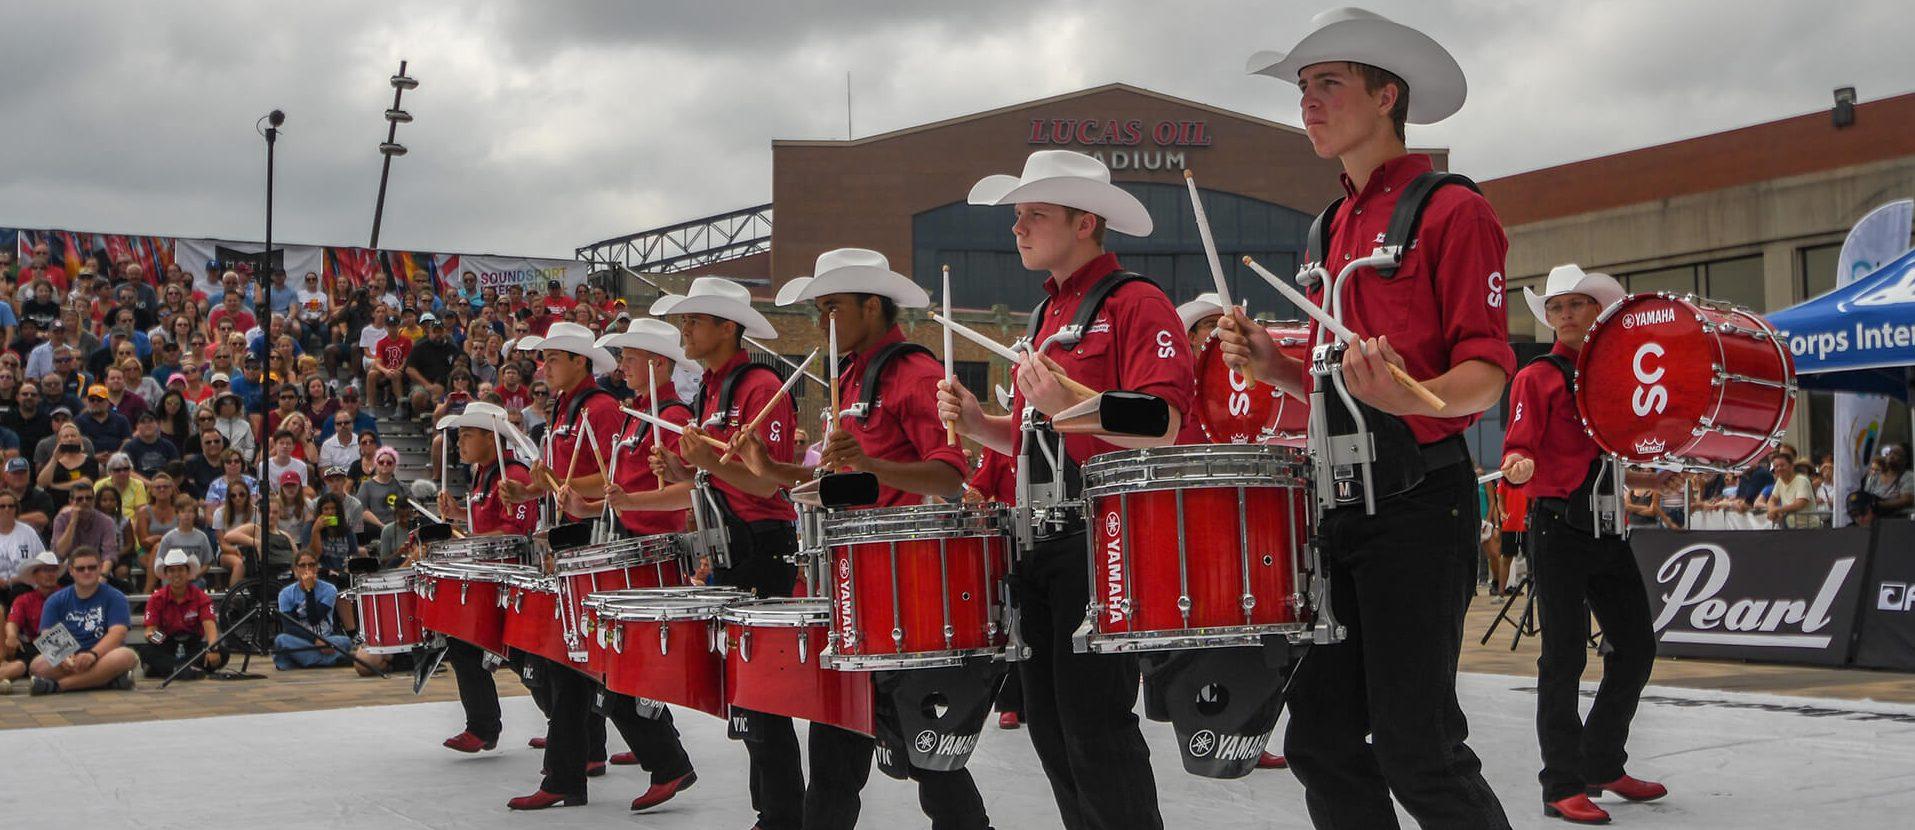 Calgary Stampede Taking Indy Drumline Battle Crown Back To